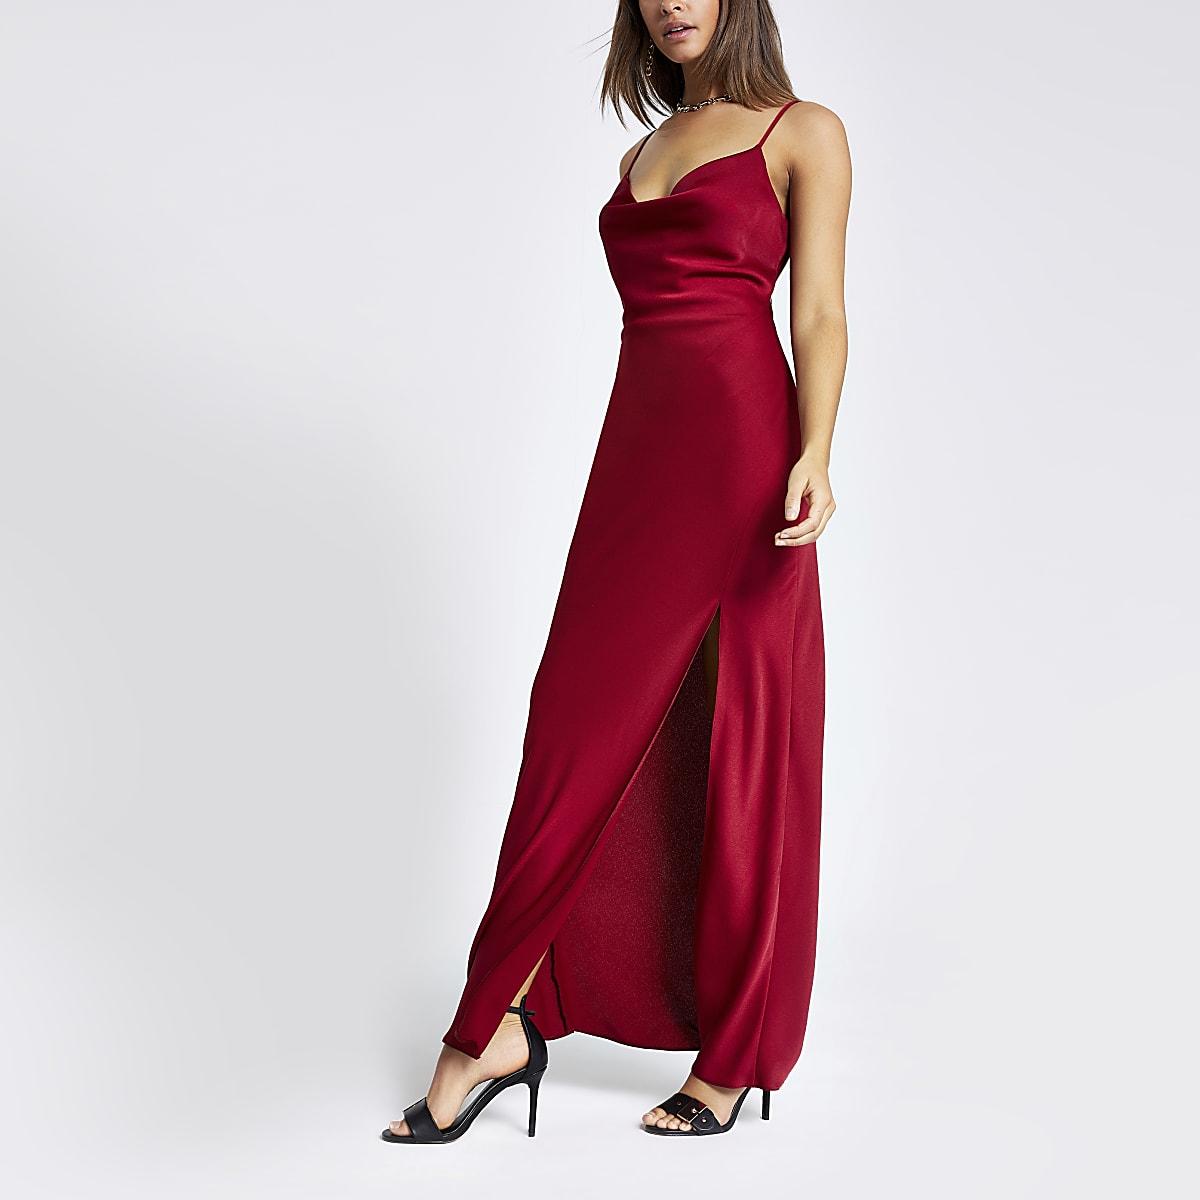 Red cowl neck maxi slip dress